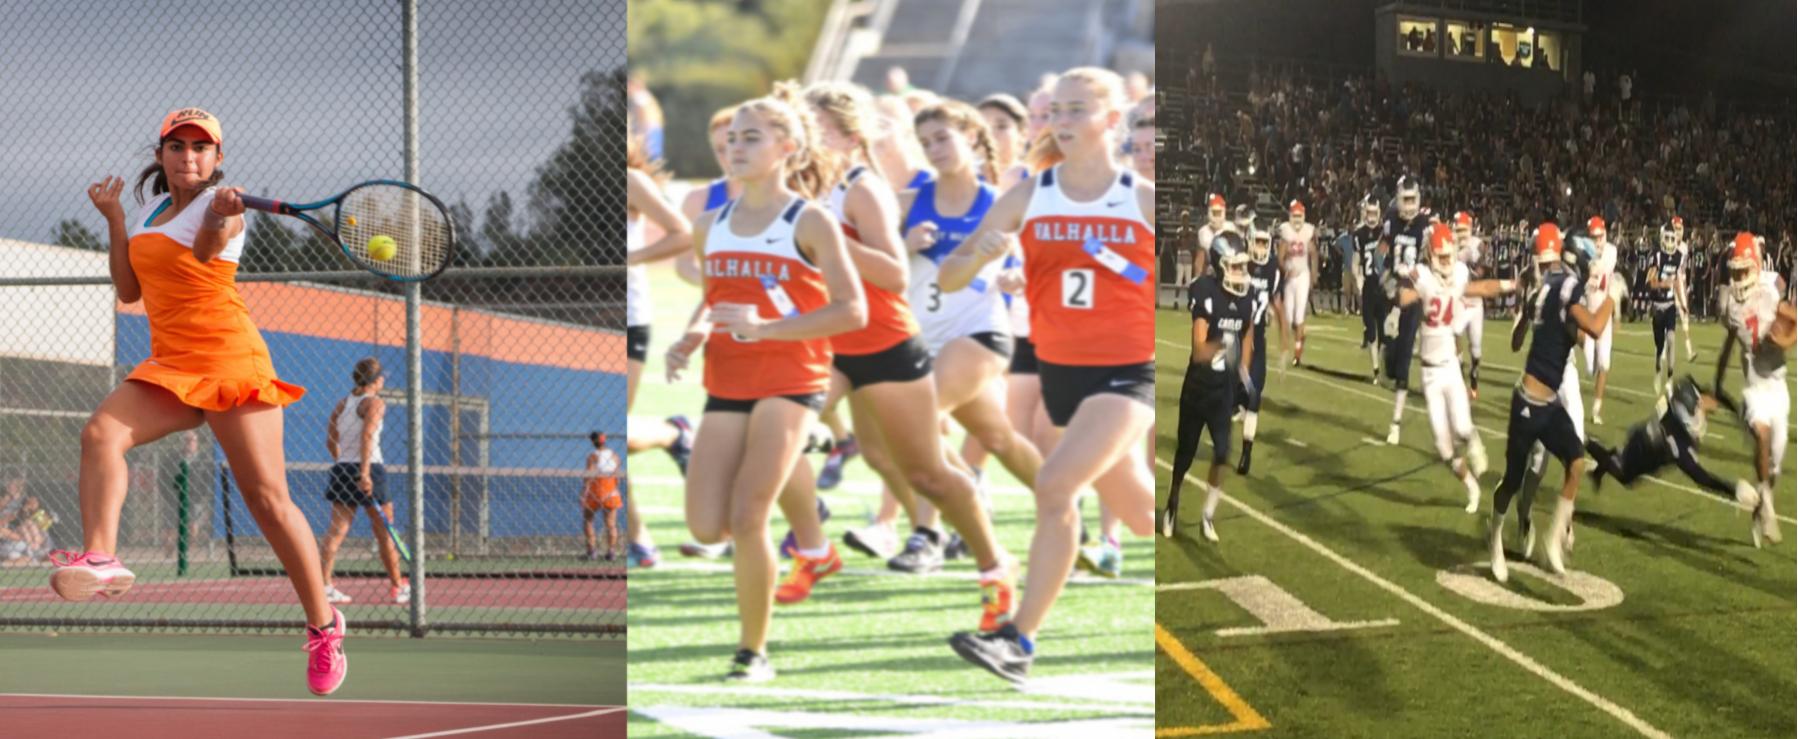 Fall Sports Kick Off This Week